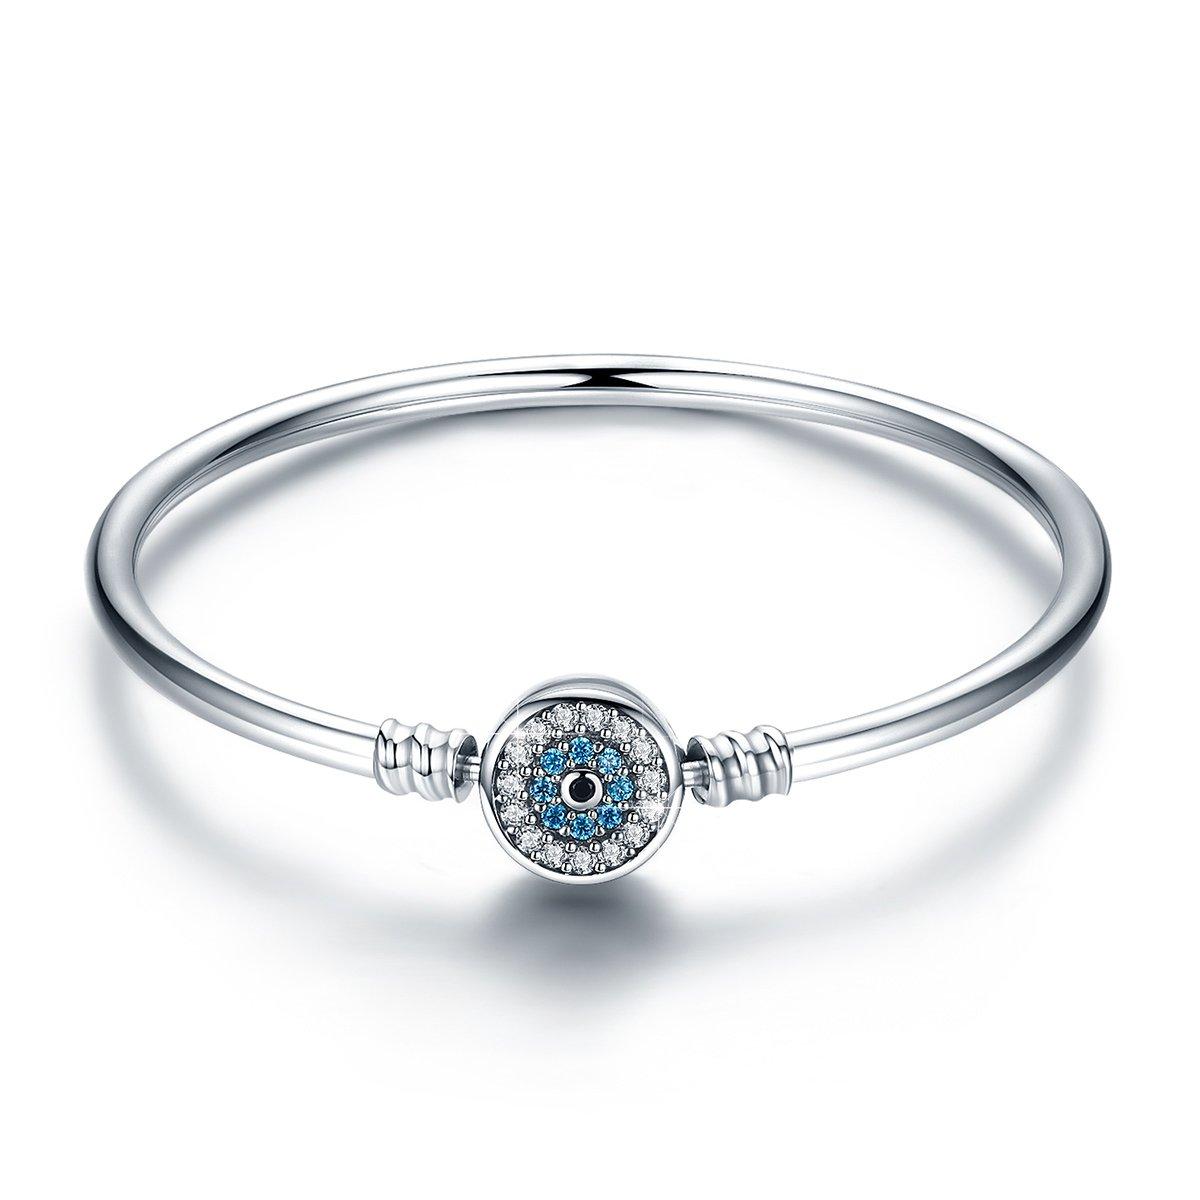 BAMOER 925 Sterling Silver Lucky Blue Evil Eye Bracelet Bangle with Sparkling Cubic Zirconia for Women Girls Evil Eye Bangle 6.7inch